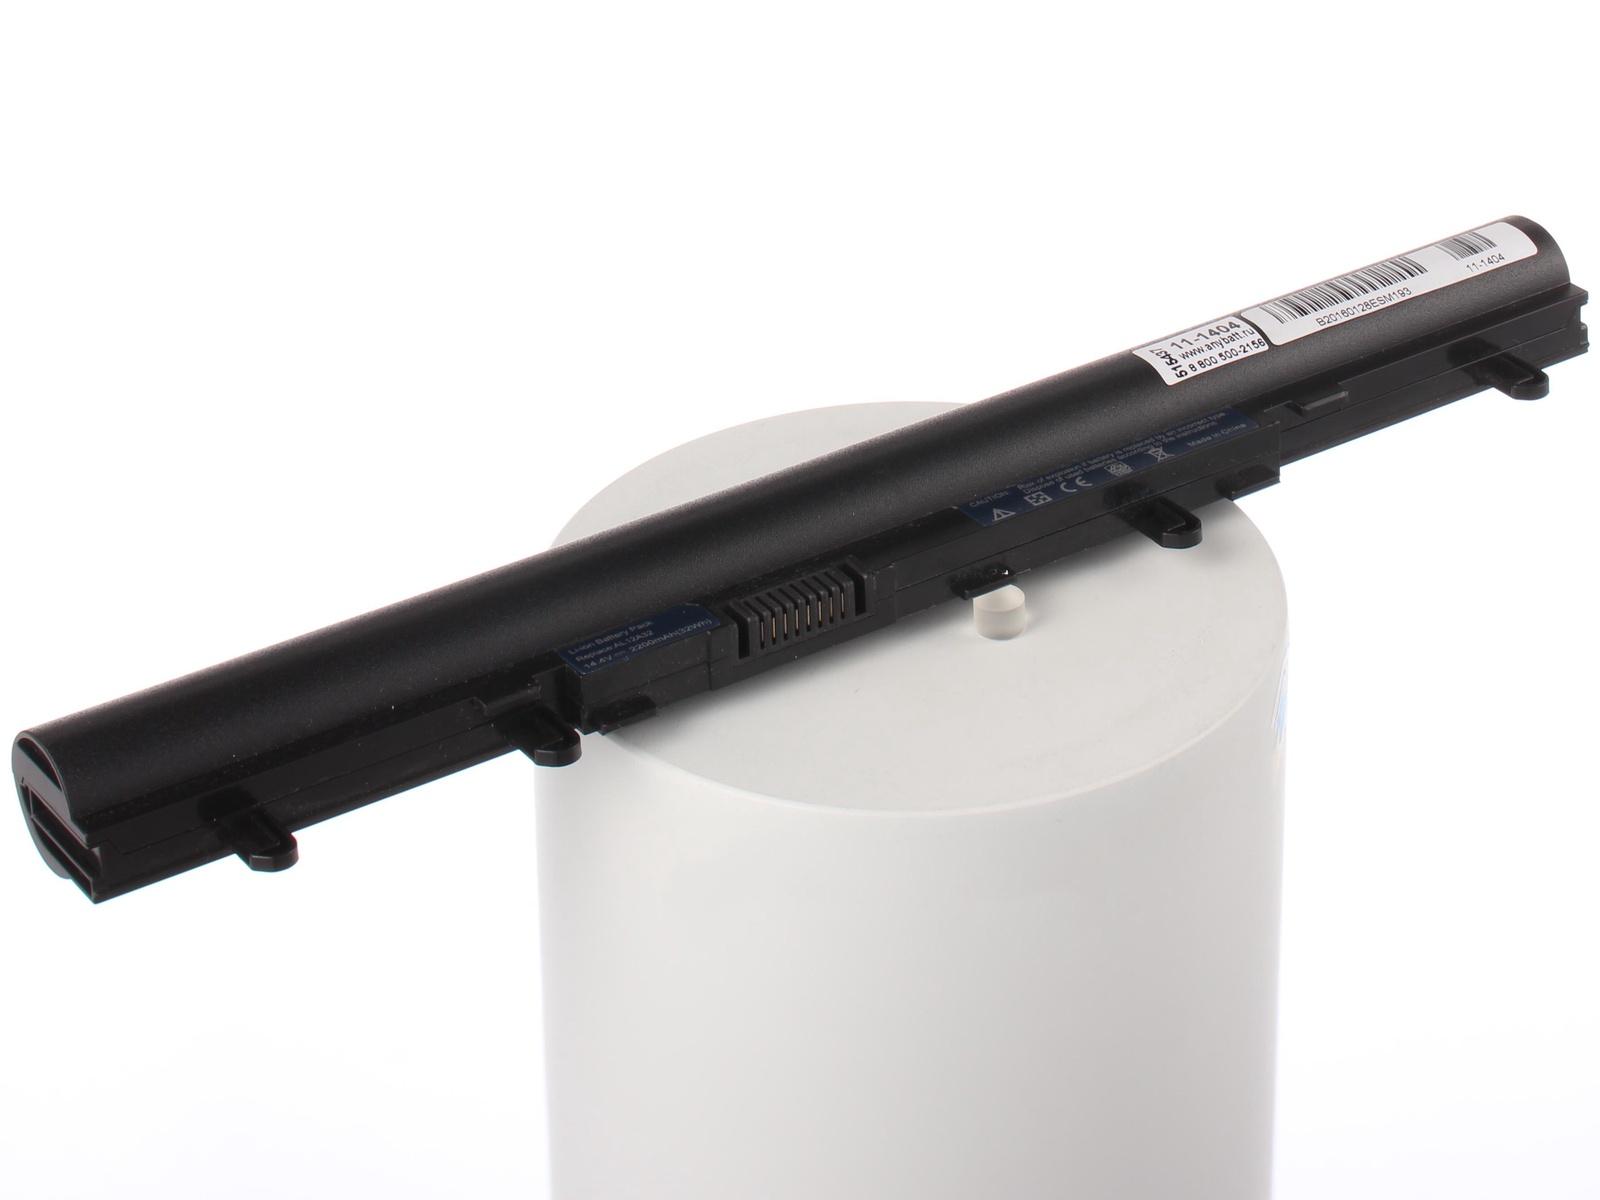 Аккумулятор для ноутбука AnyBatt для Acer Aspire E1-570G-53336G1TMnii, Aspire E1-572G-34016G75Mnkk, Aspire E1-570G-53334G50Mn, Aspire V5-571PG-53314G50Mass, Aspire V5-571G-32364G50Mabb, Aspire V5-571G-52466G50Mabb аккумулятор для ноутбука anybatt для acer aspire e1 532g 35584g50mnkk aspire e1 570g 33214g32mnkk aspire v5 571pg 73536g75ma aspire e1 470p 6659 aspire e1 522 12504g50mn aspire e1 522 45004g1tmn aspire e1 570g 33214g50mnii